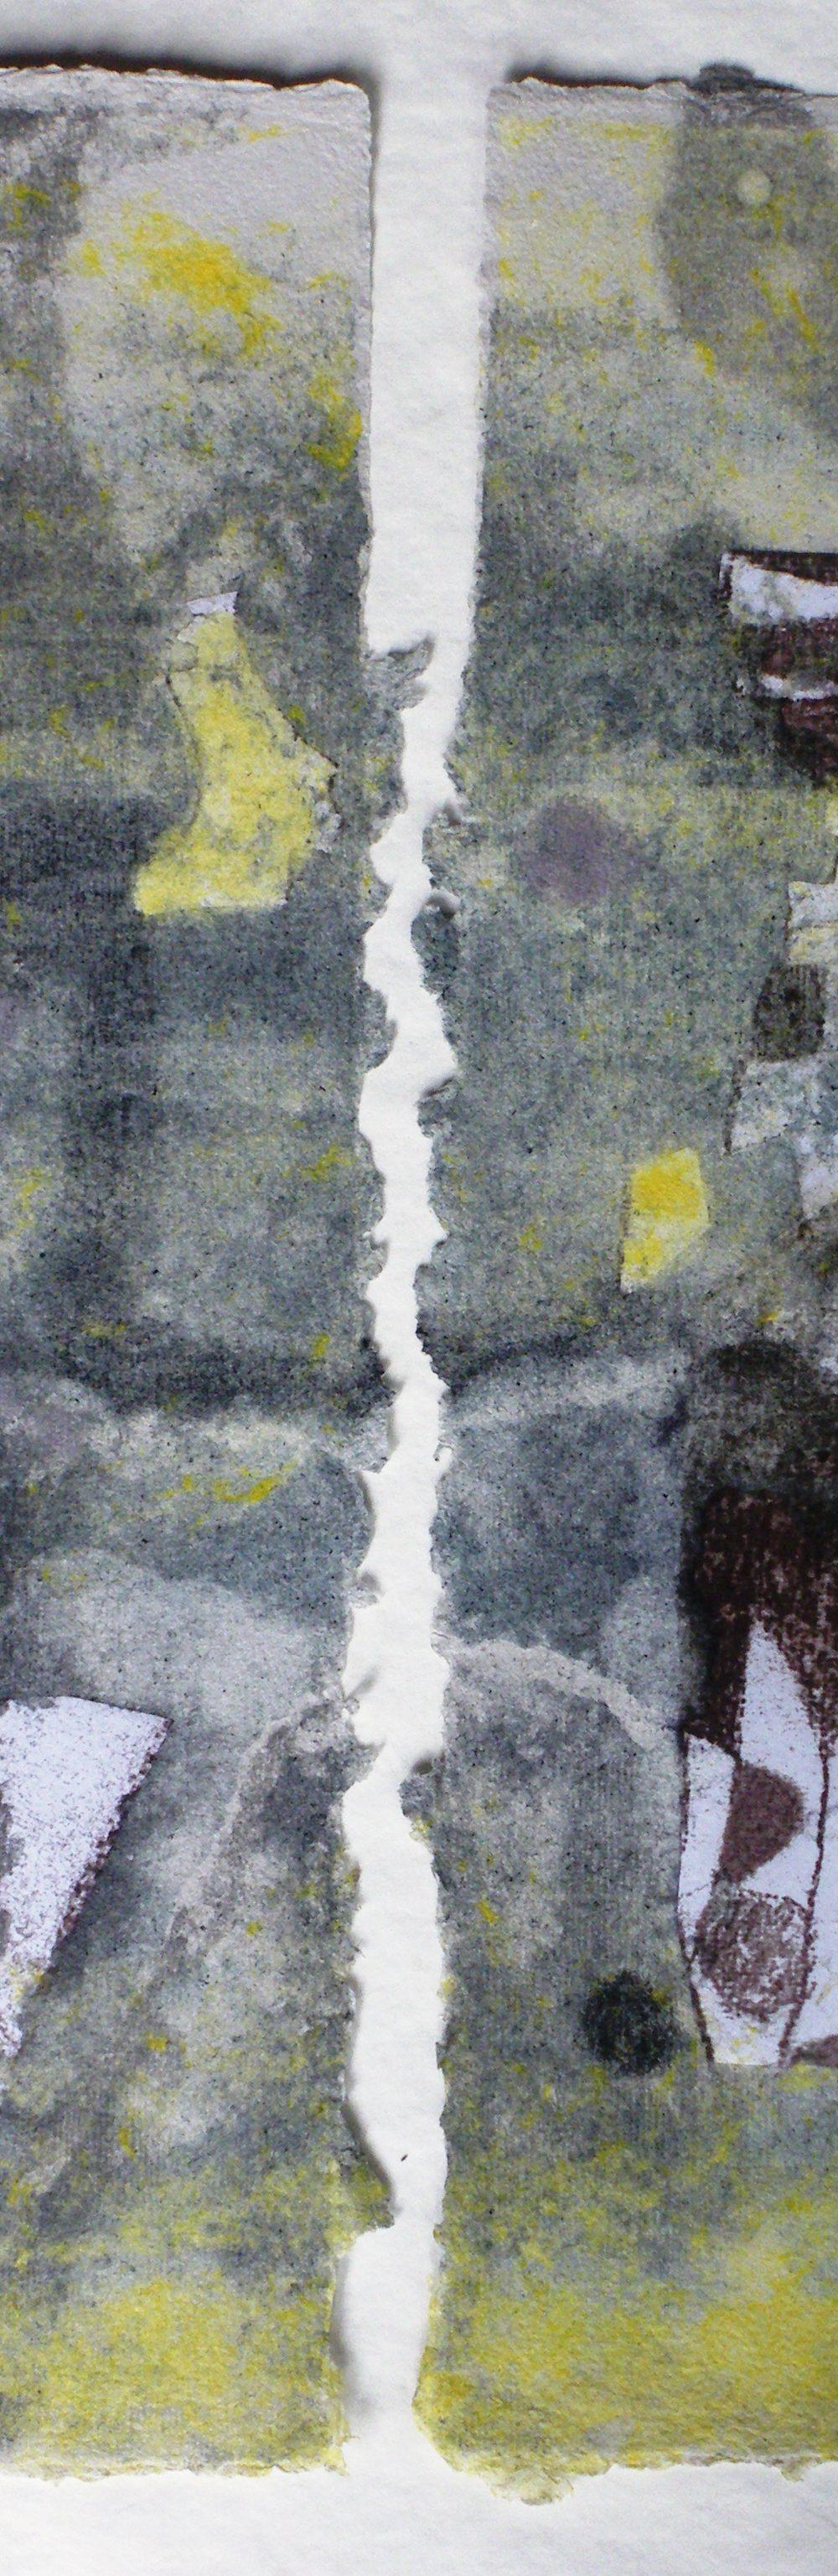 Fragmente V und VI (Diptychon)